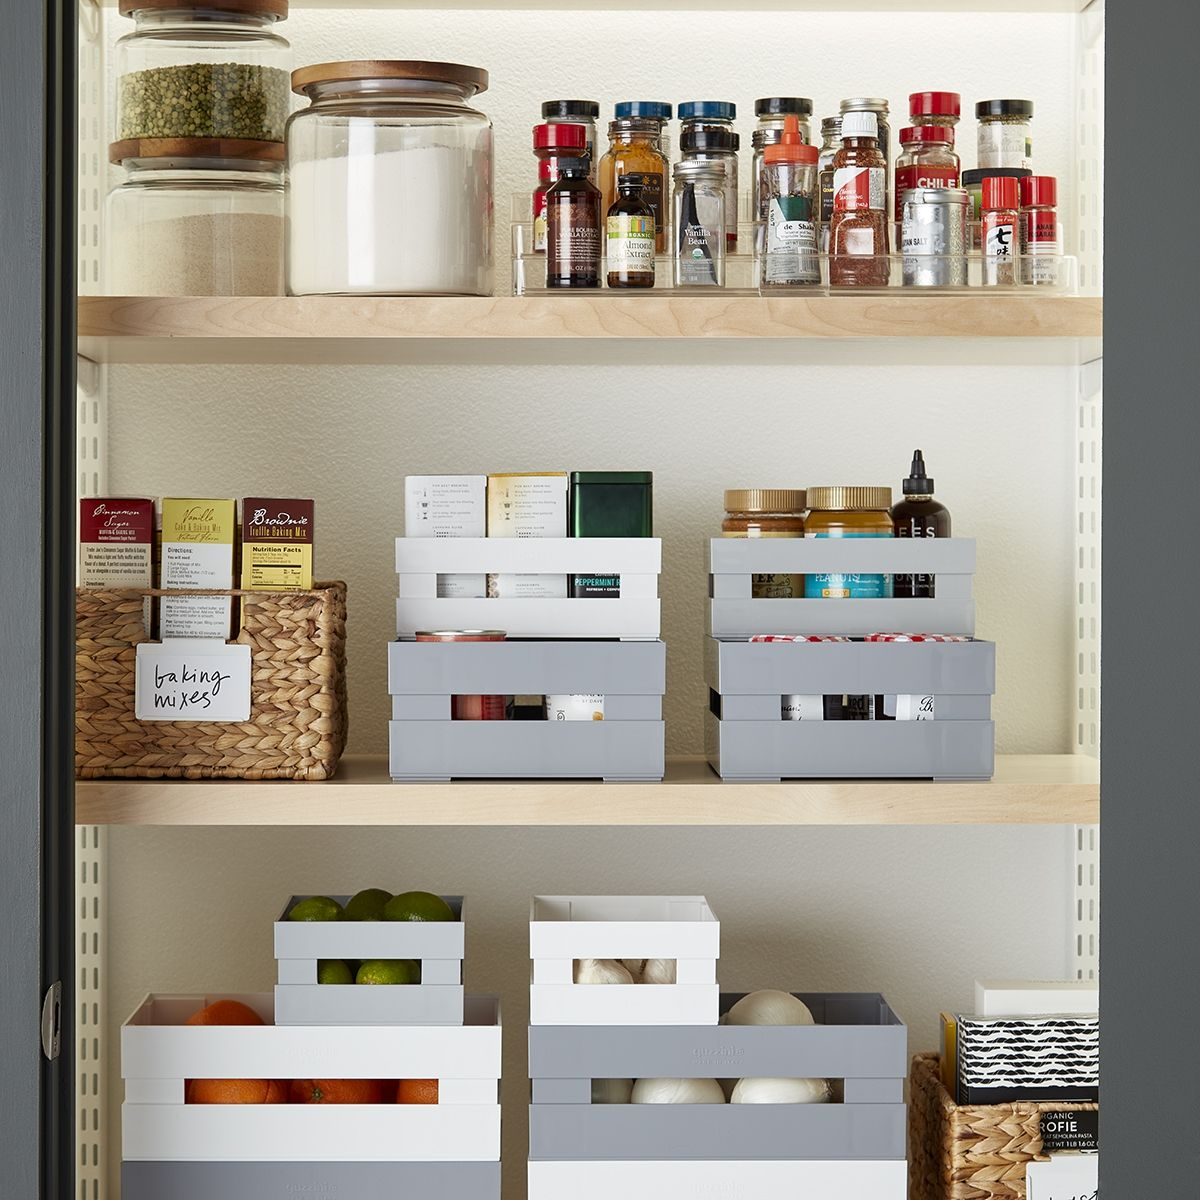 Simple Ways To Keep Your Small Pantry Organized Pantry Bin Kitchen Organization Small Storage Containers Kitchen storage organization ideas